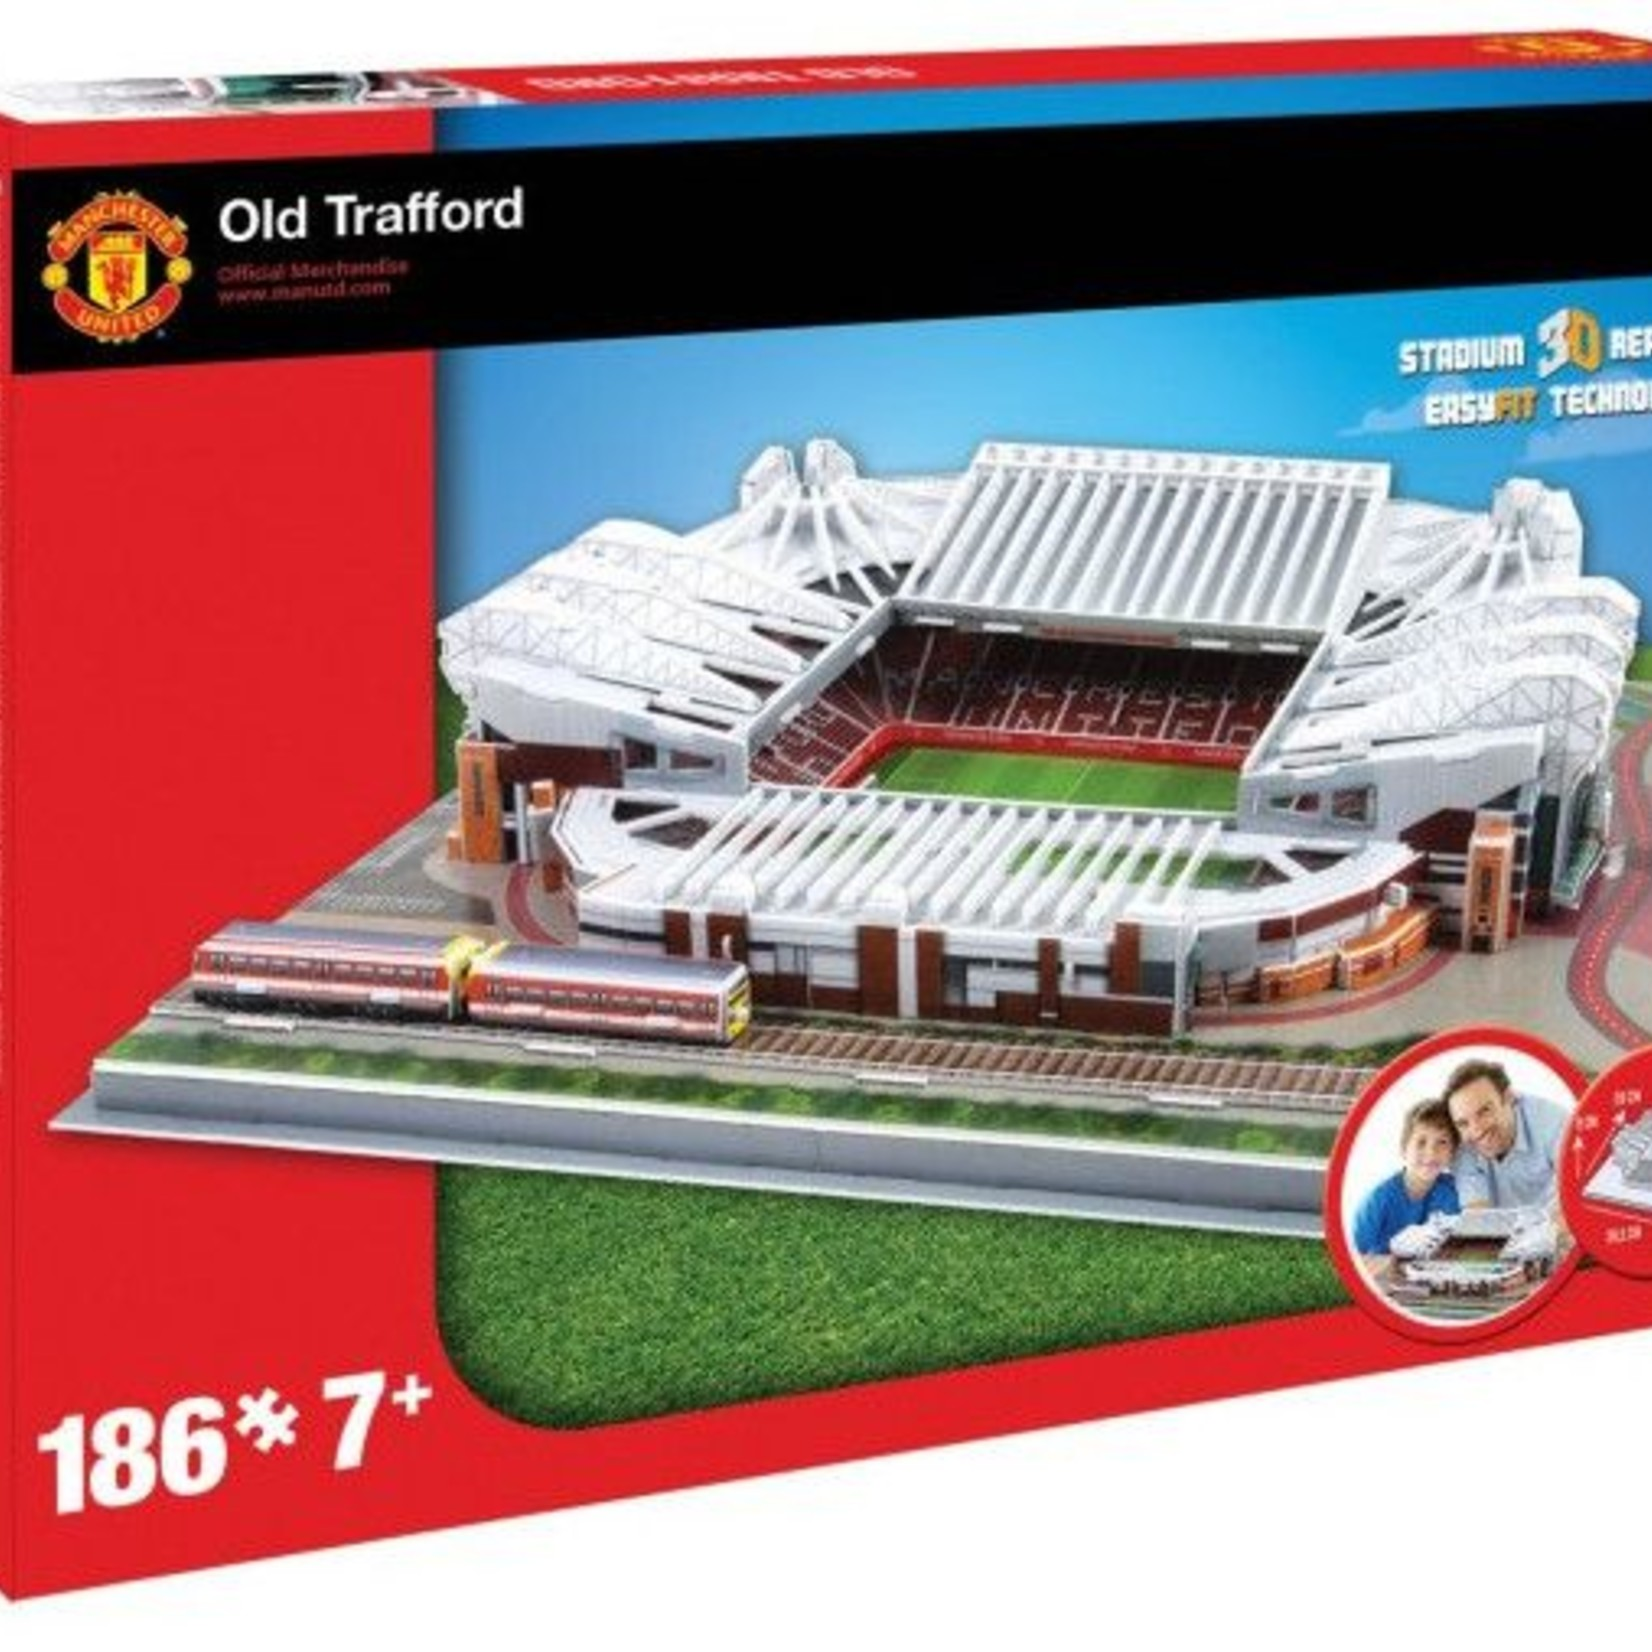 Puzzel Manchester United: Old Traffort 186 stukjes